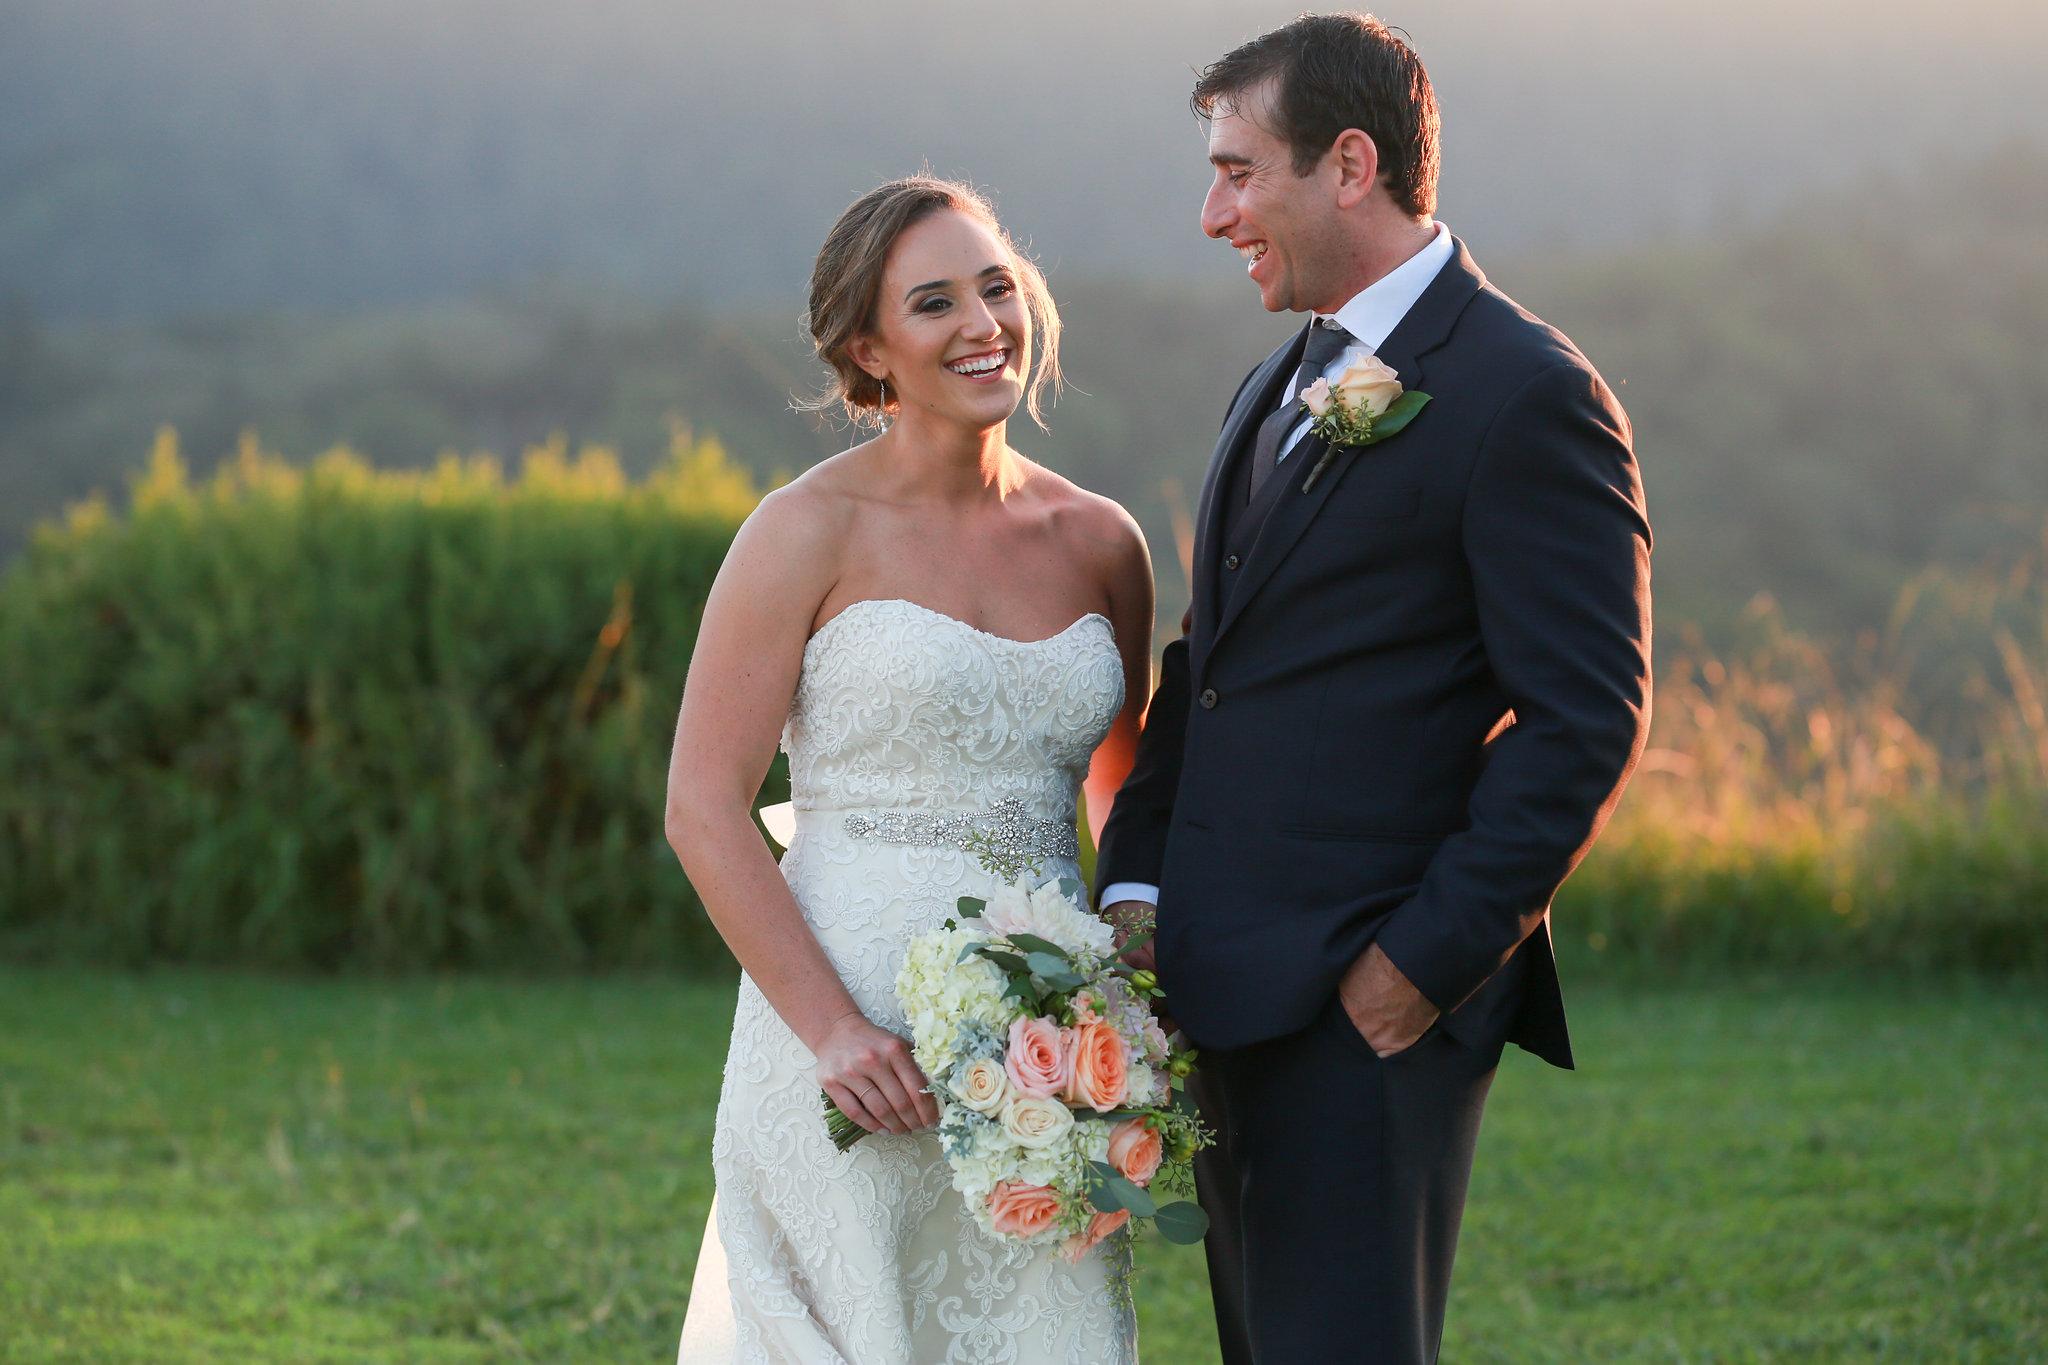 Fairview Crystal Springs wedding photography-17.jpg